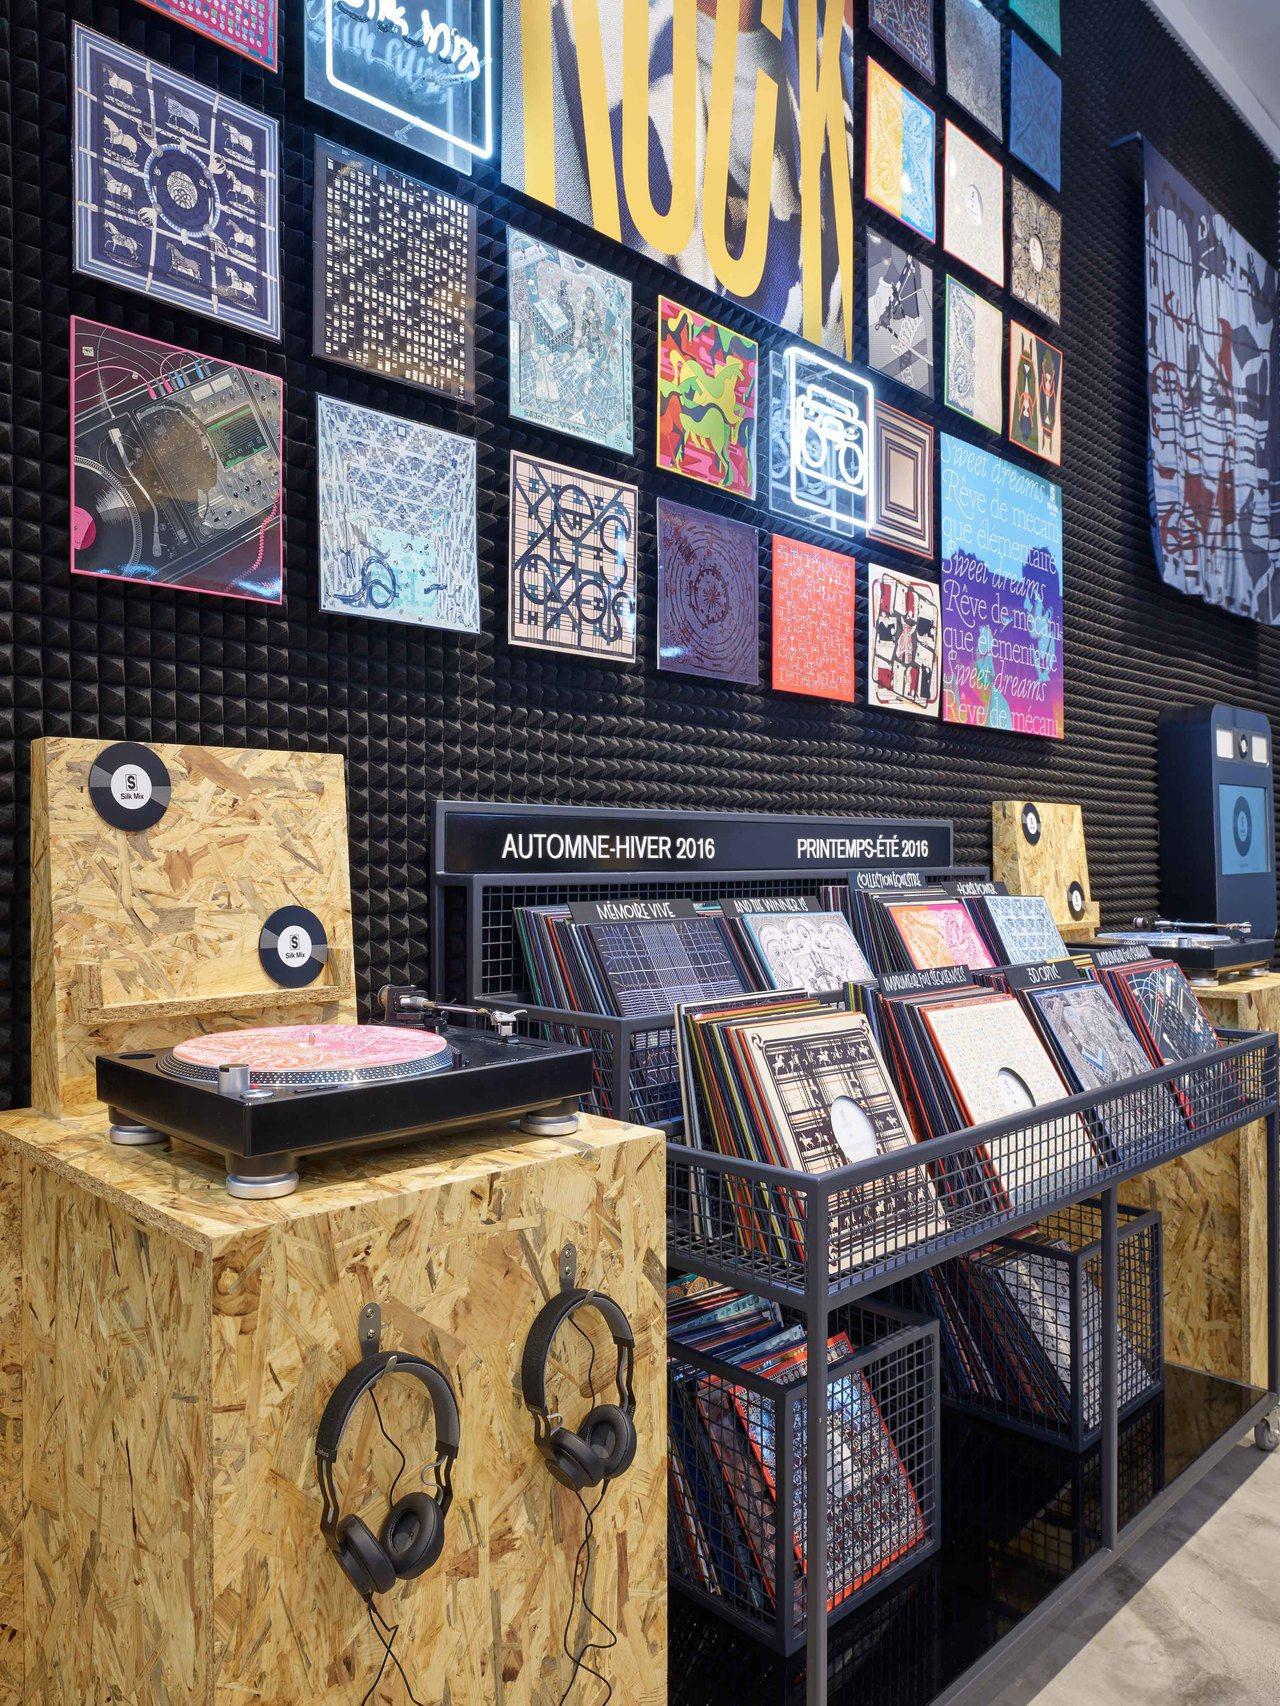 「Silk Mix男士絲巾快閃店」將以黑膠唱片行為靈感。圖/愛馬仕提供